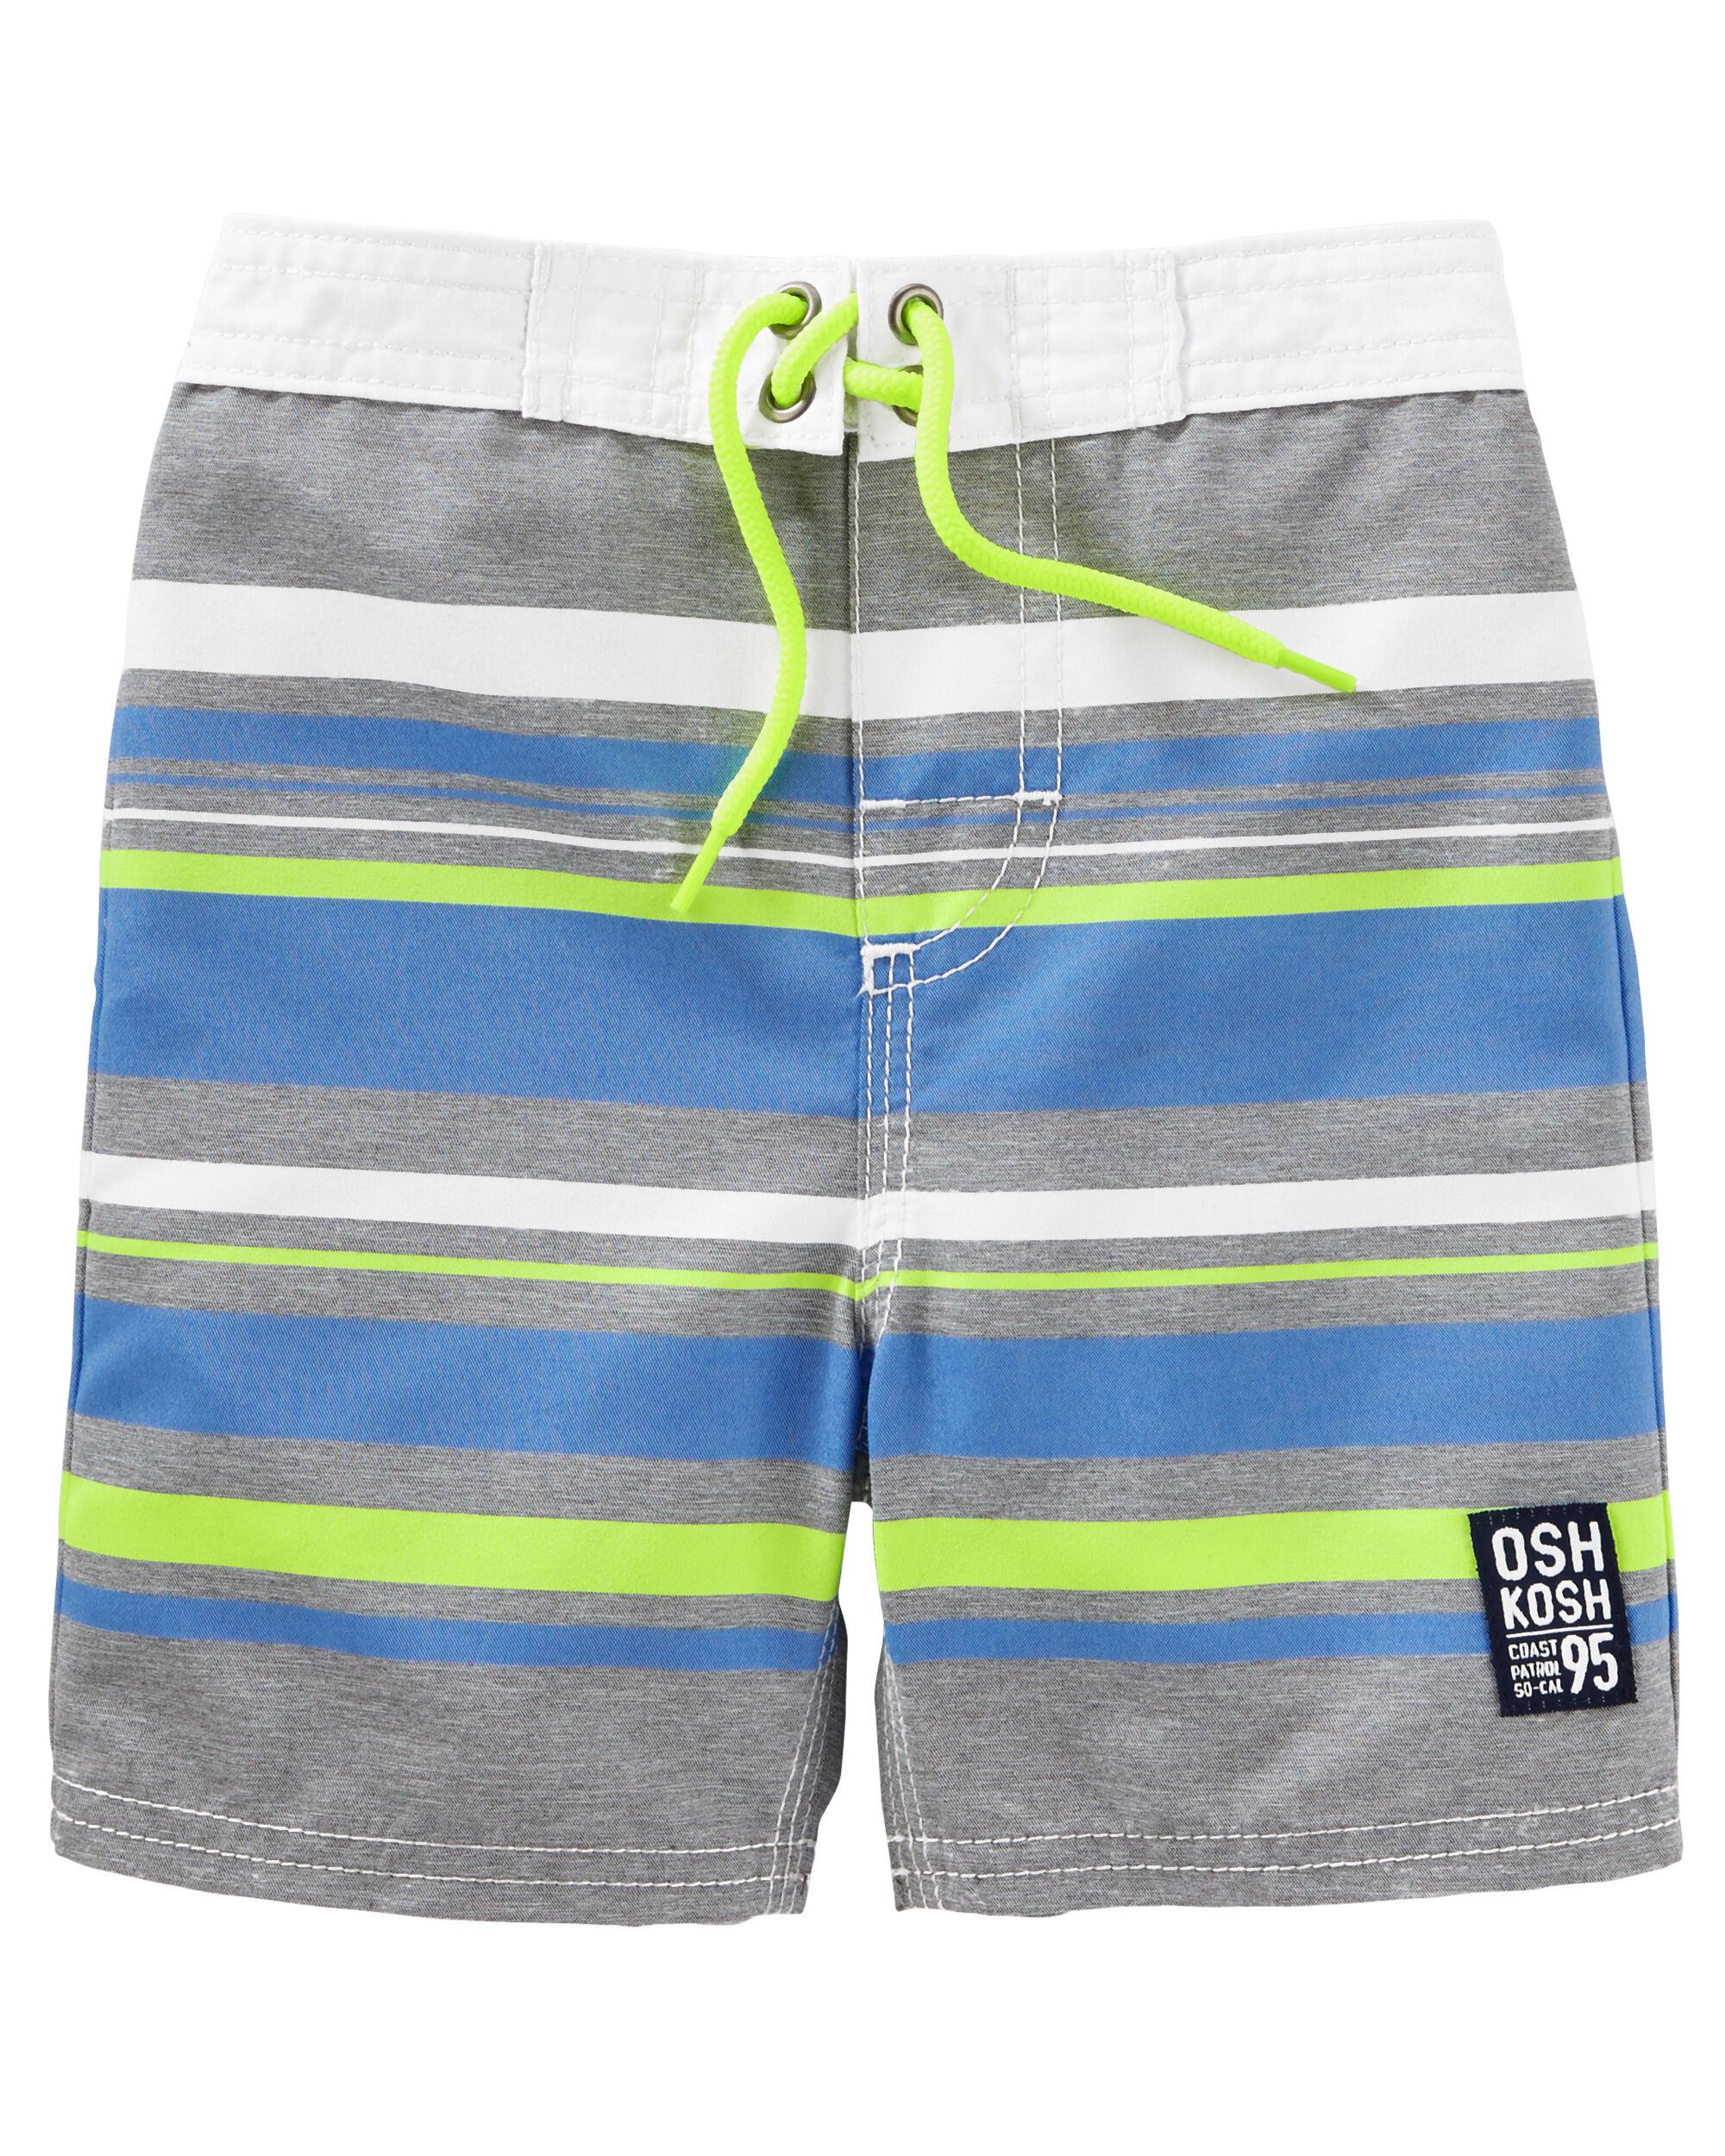 OshKosh Neon Stripe Swim Trunks